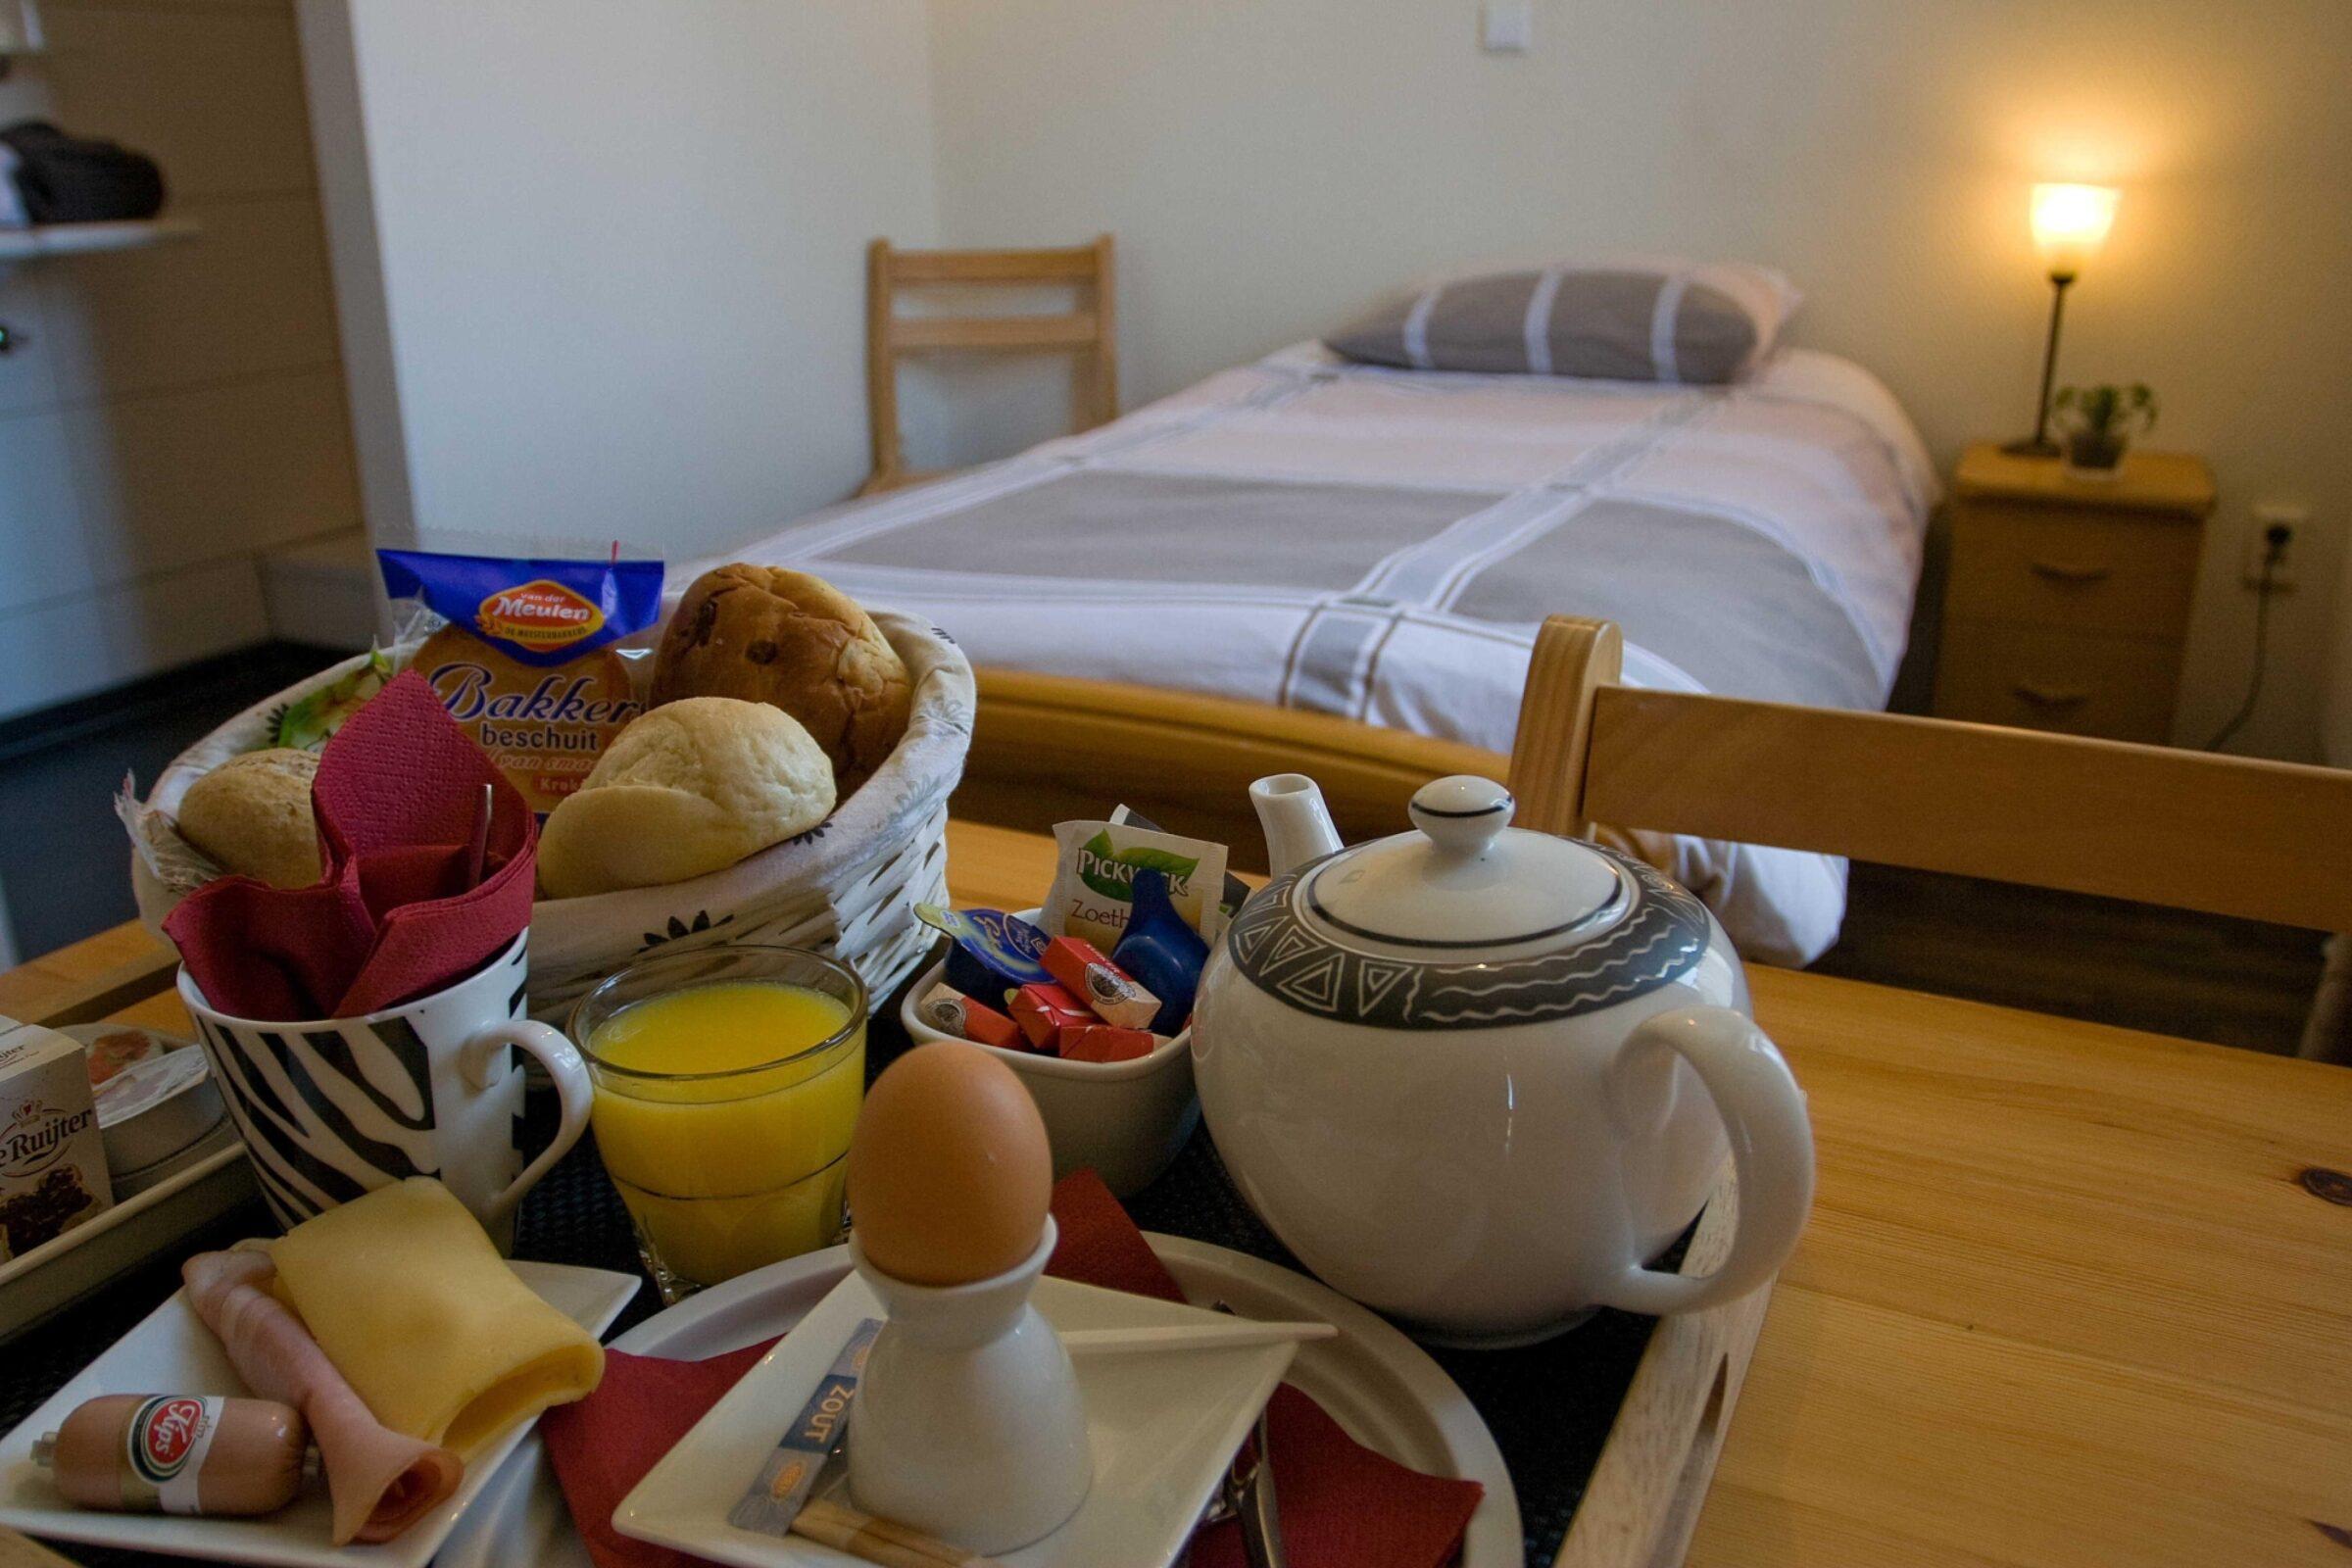 Bed & breakfast ensche day inn enschede